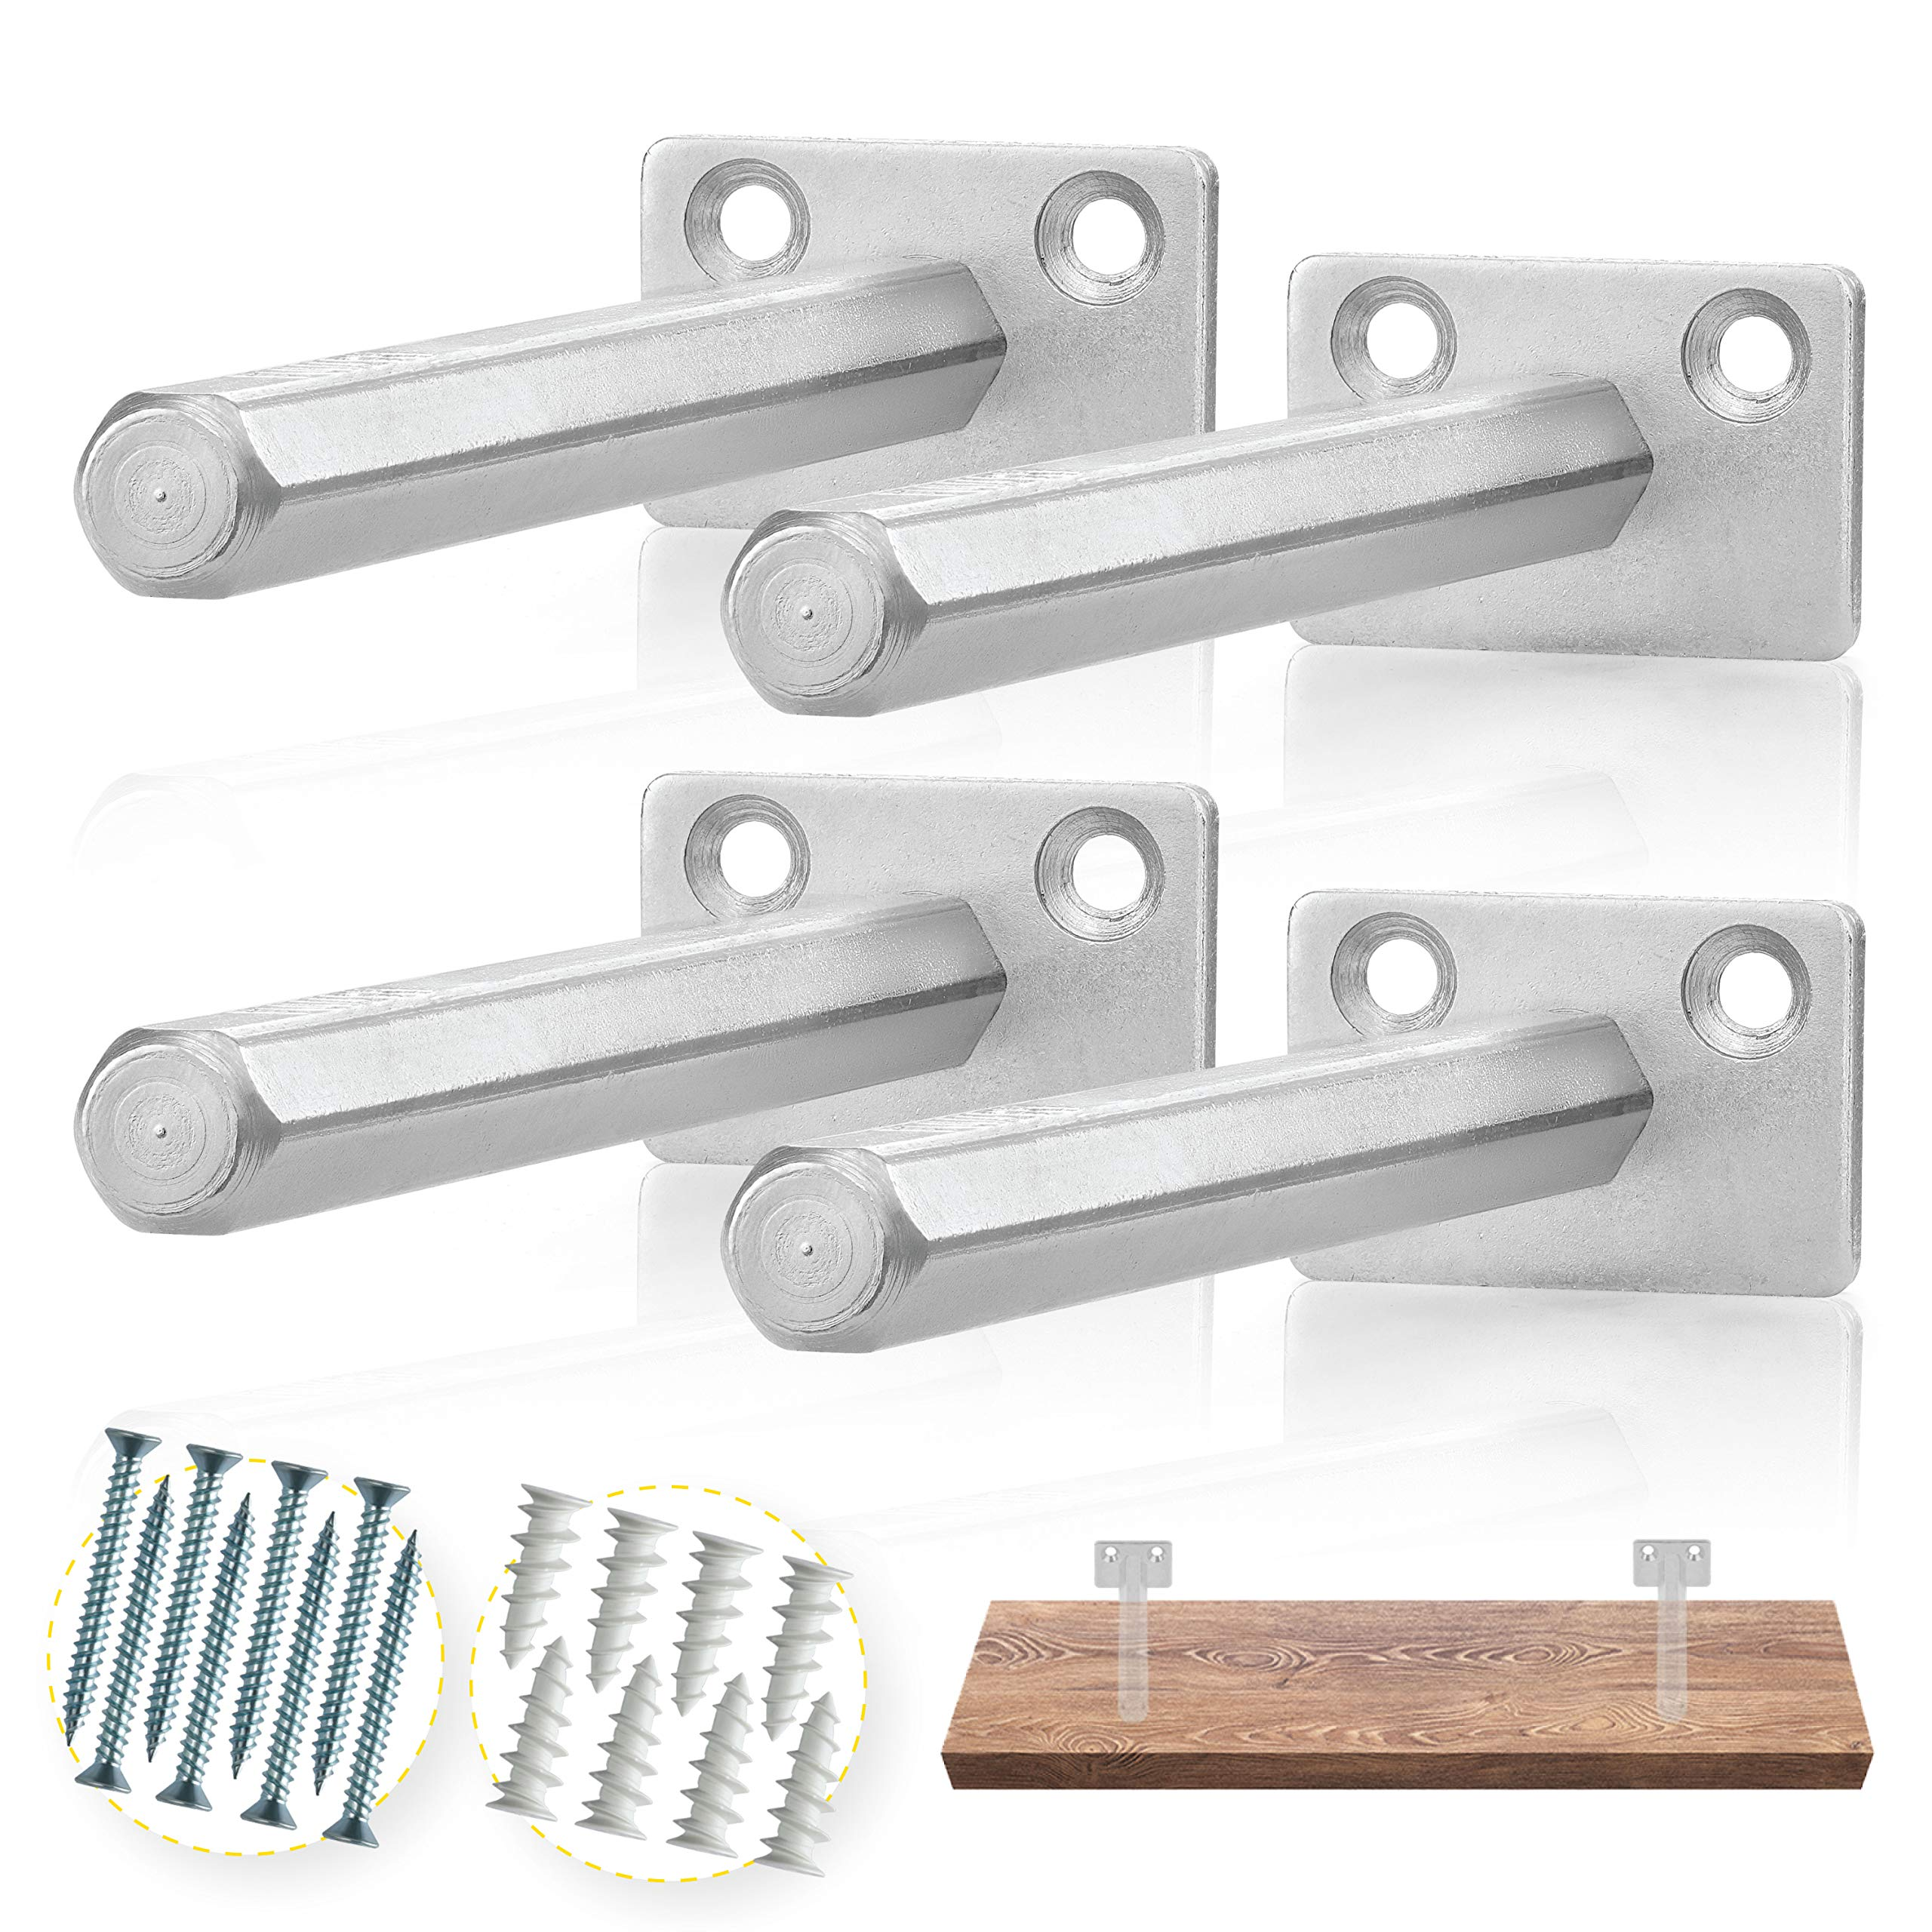 BATODA Floating Shelf Bracket (4 pcs Galvanized Steel) - Blind Shelf Supports - Hidden Brackets for Floating Wood Shelves - Concealed Blind shelf Support - Screws and Wall plugs Included  by BATODA